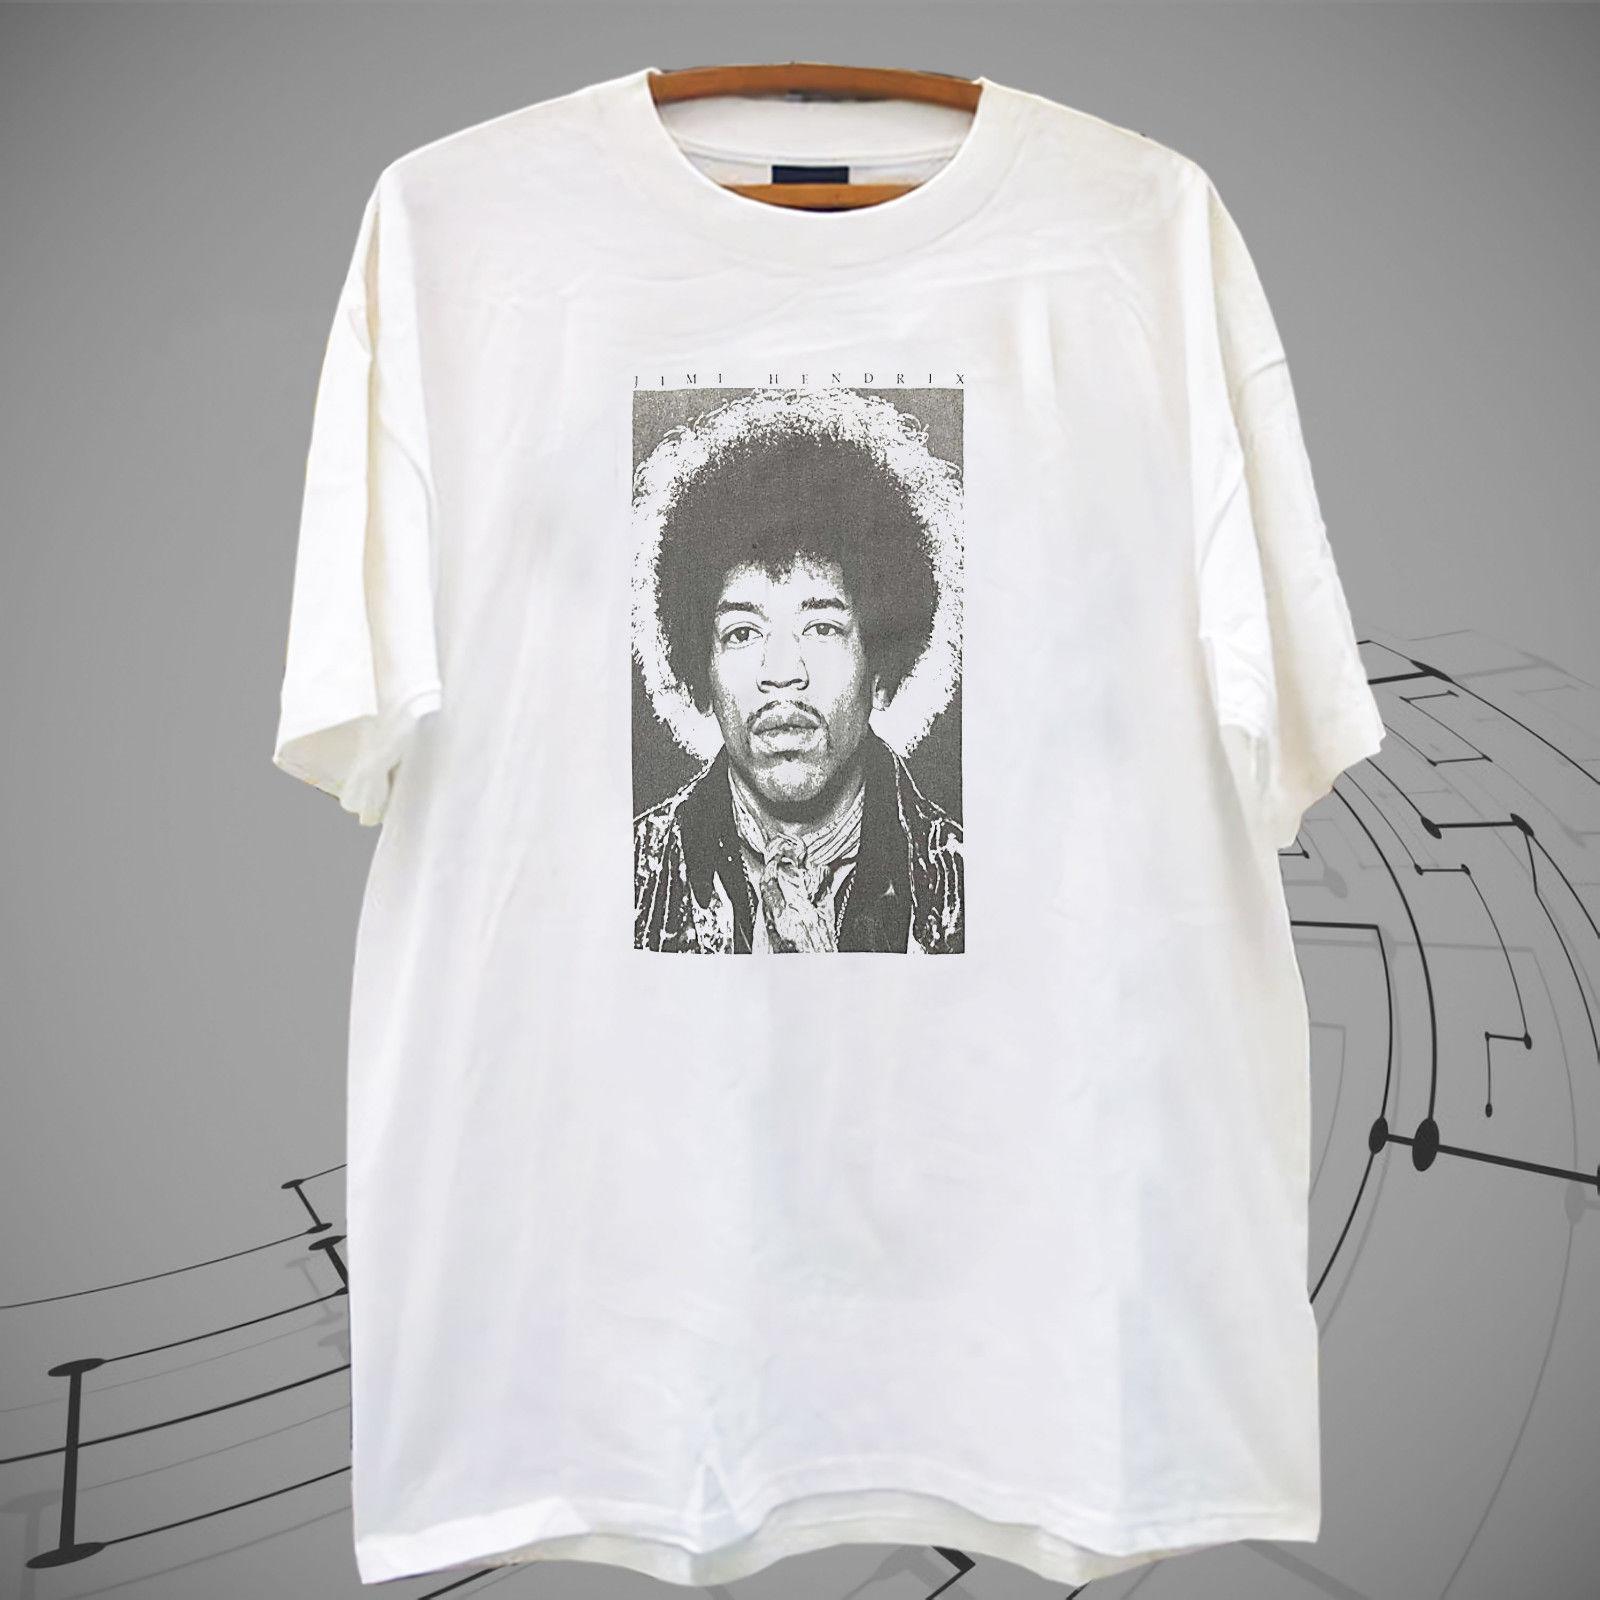 c2fe5f01744 Jimi Hendrix White T Shirt Tee XS 2XL Funny Unisex Casual Tshirt Top Mens  Dress Shirt Patriotic T Shirts From Deepseastation